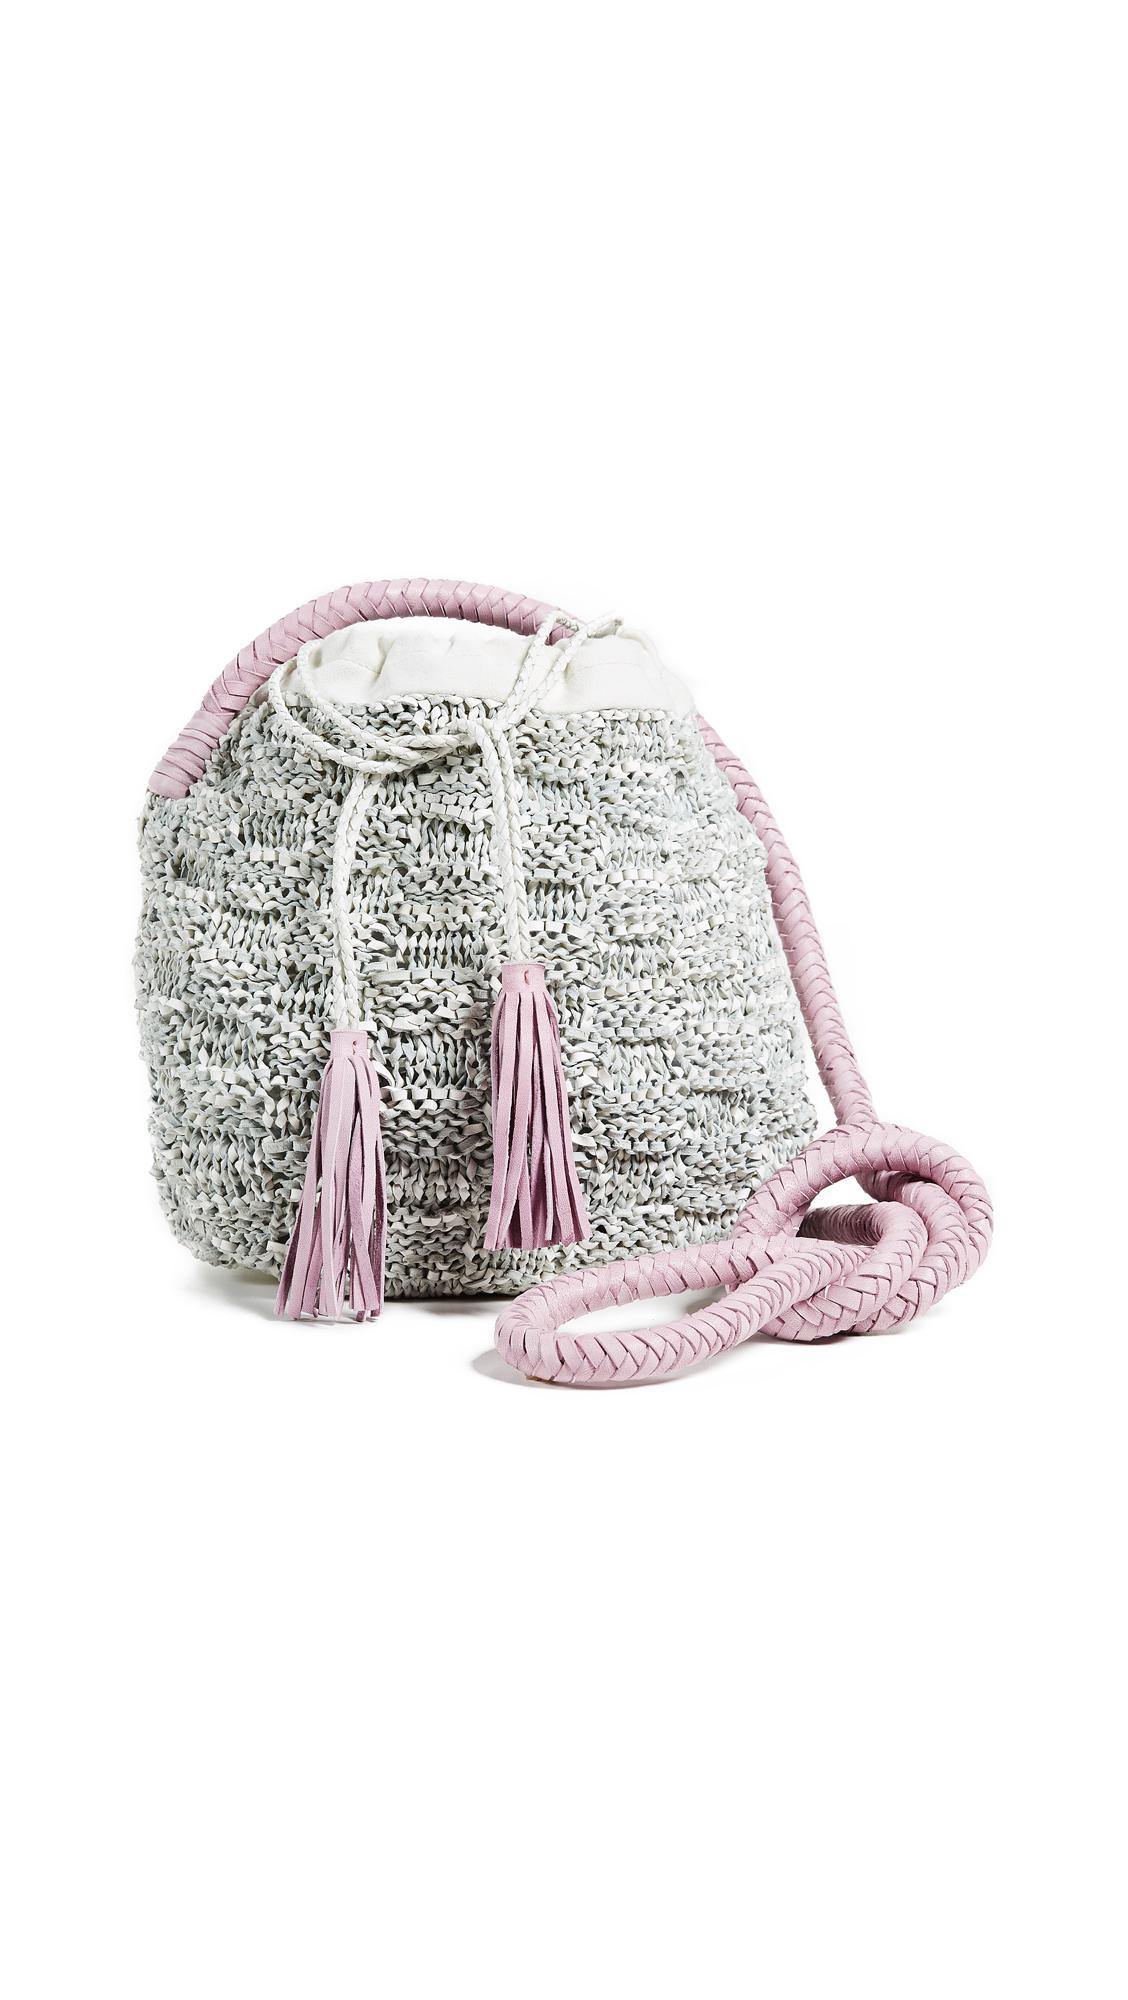 PORTIA KNIT LEATHER BUCKET BAG